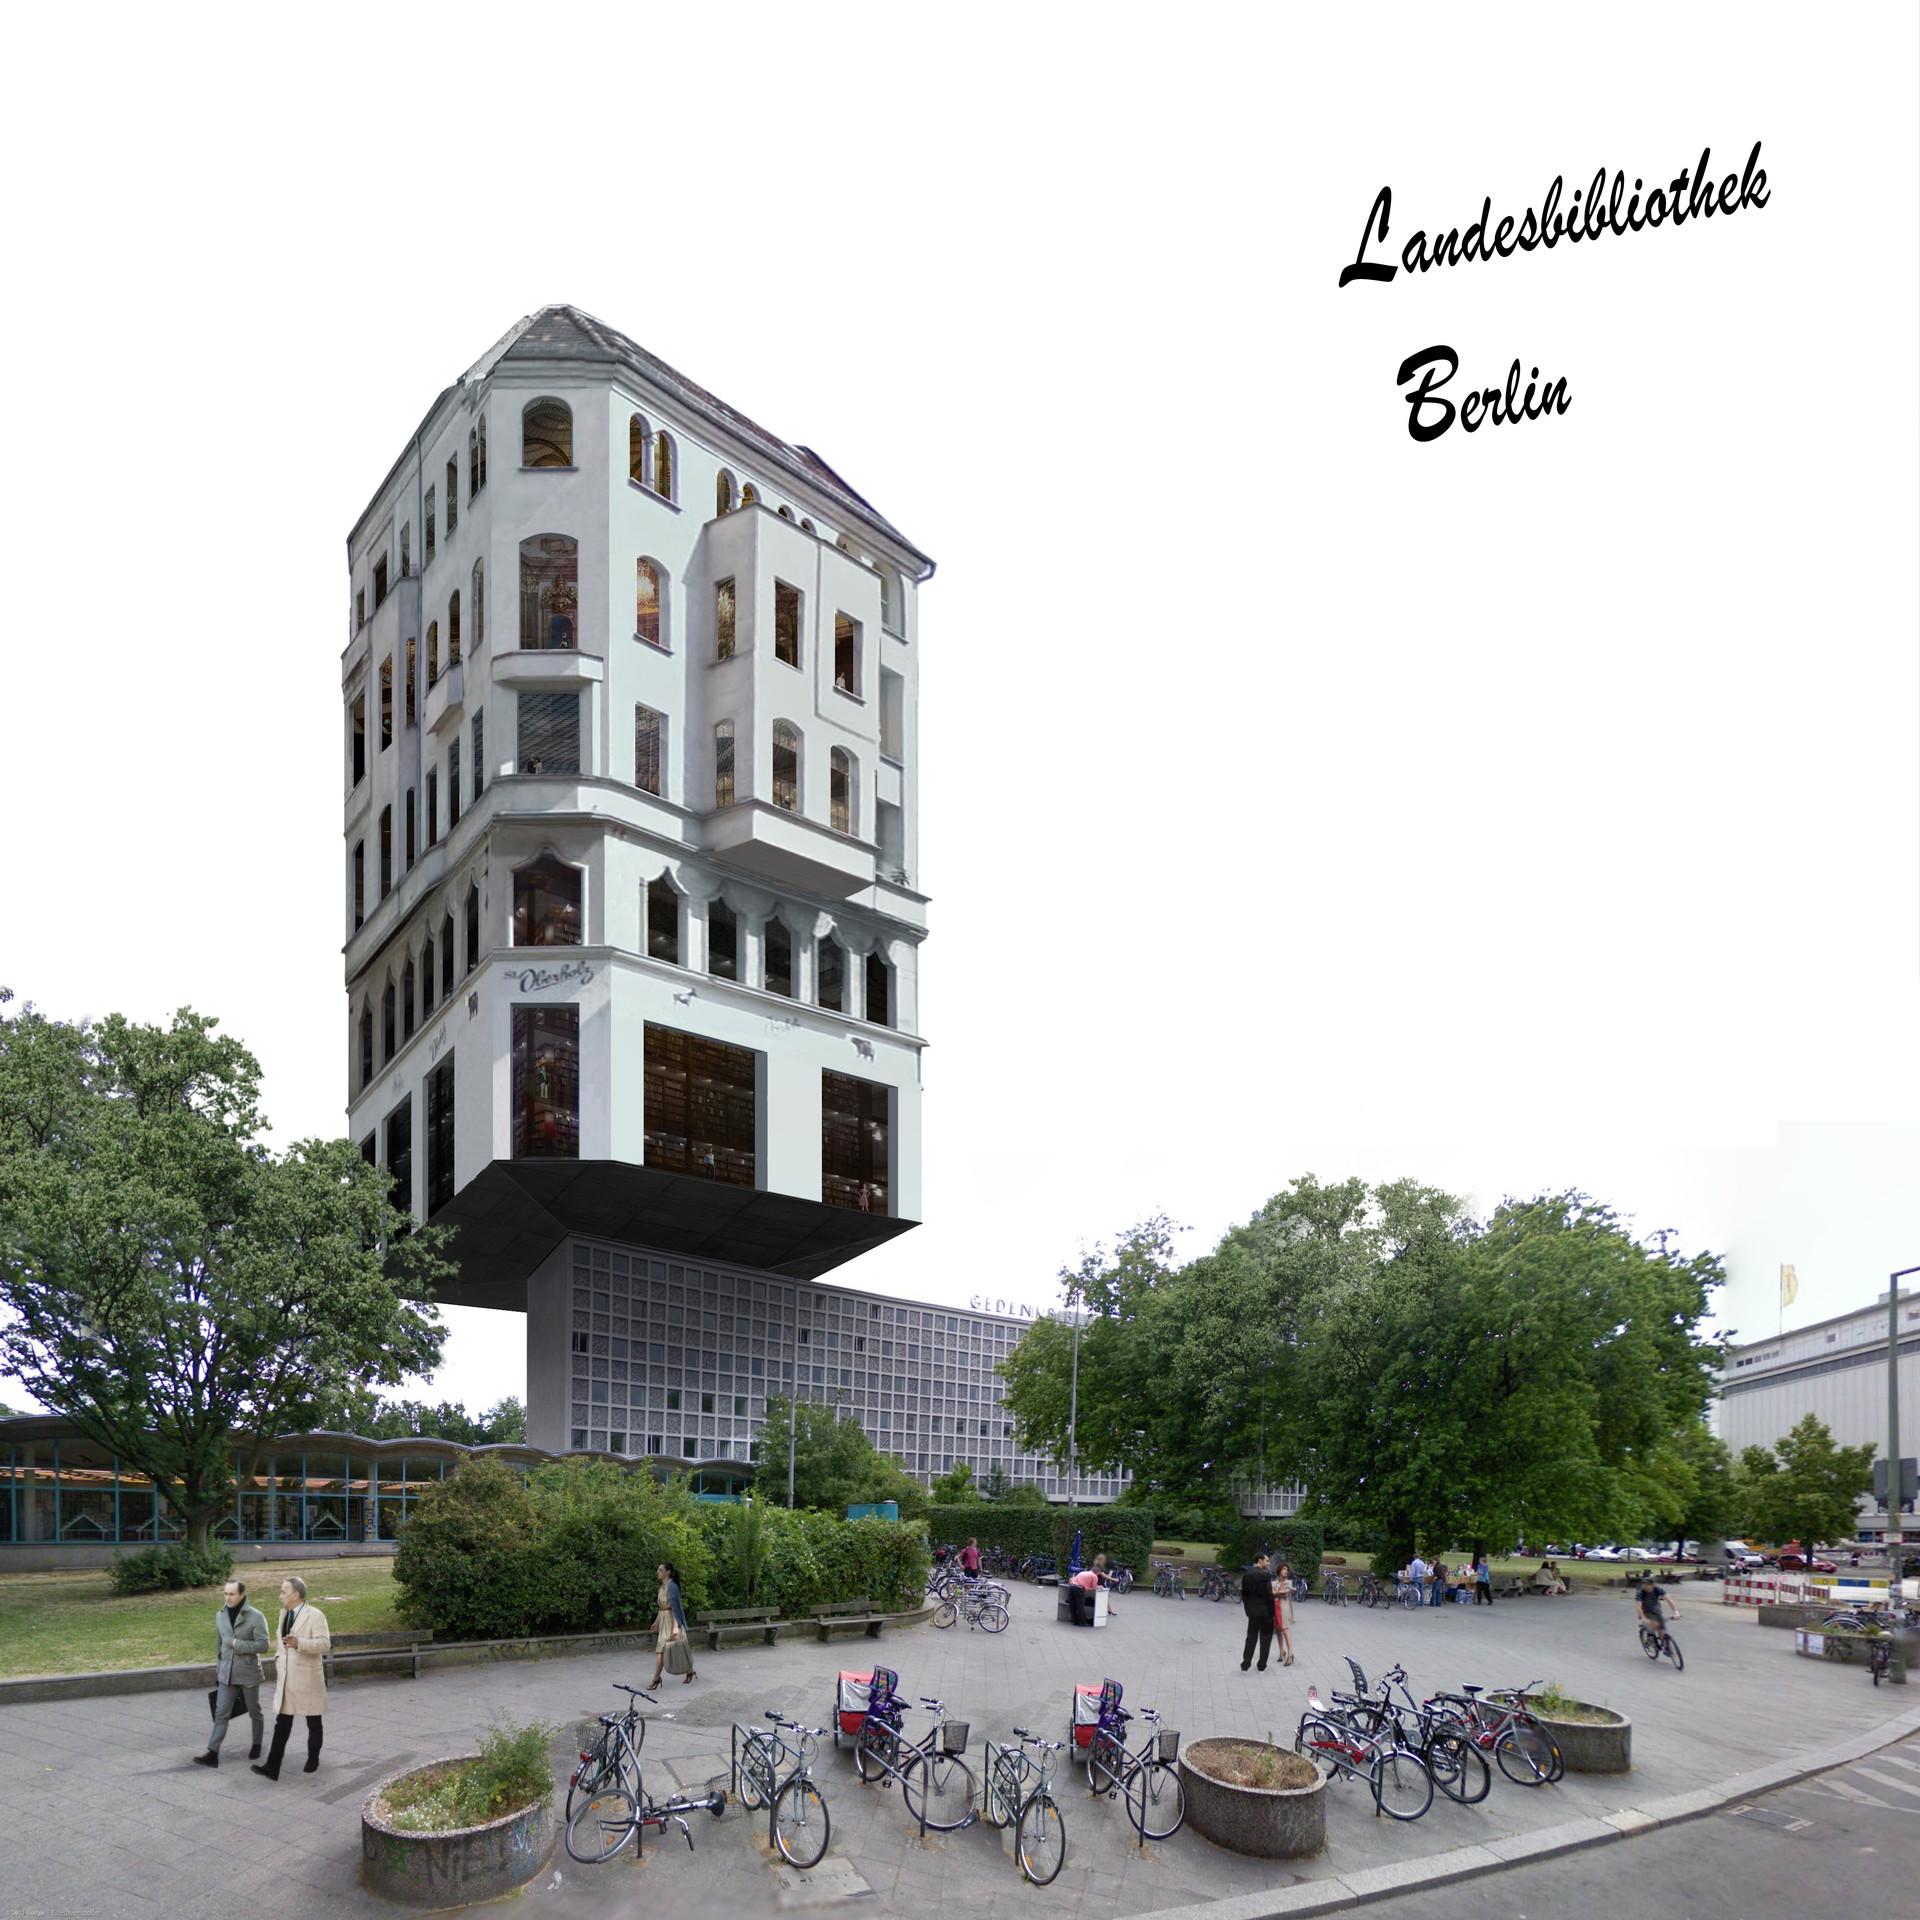 40/40 Stadtbibliothek © Thomas Stadler